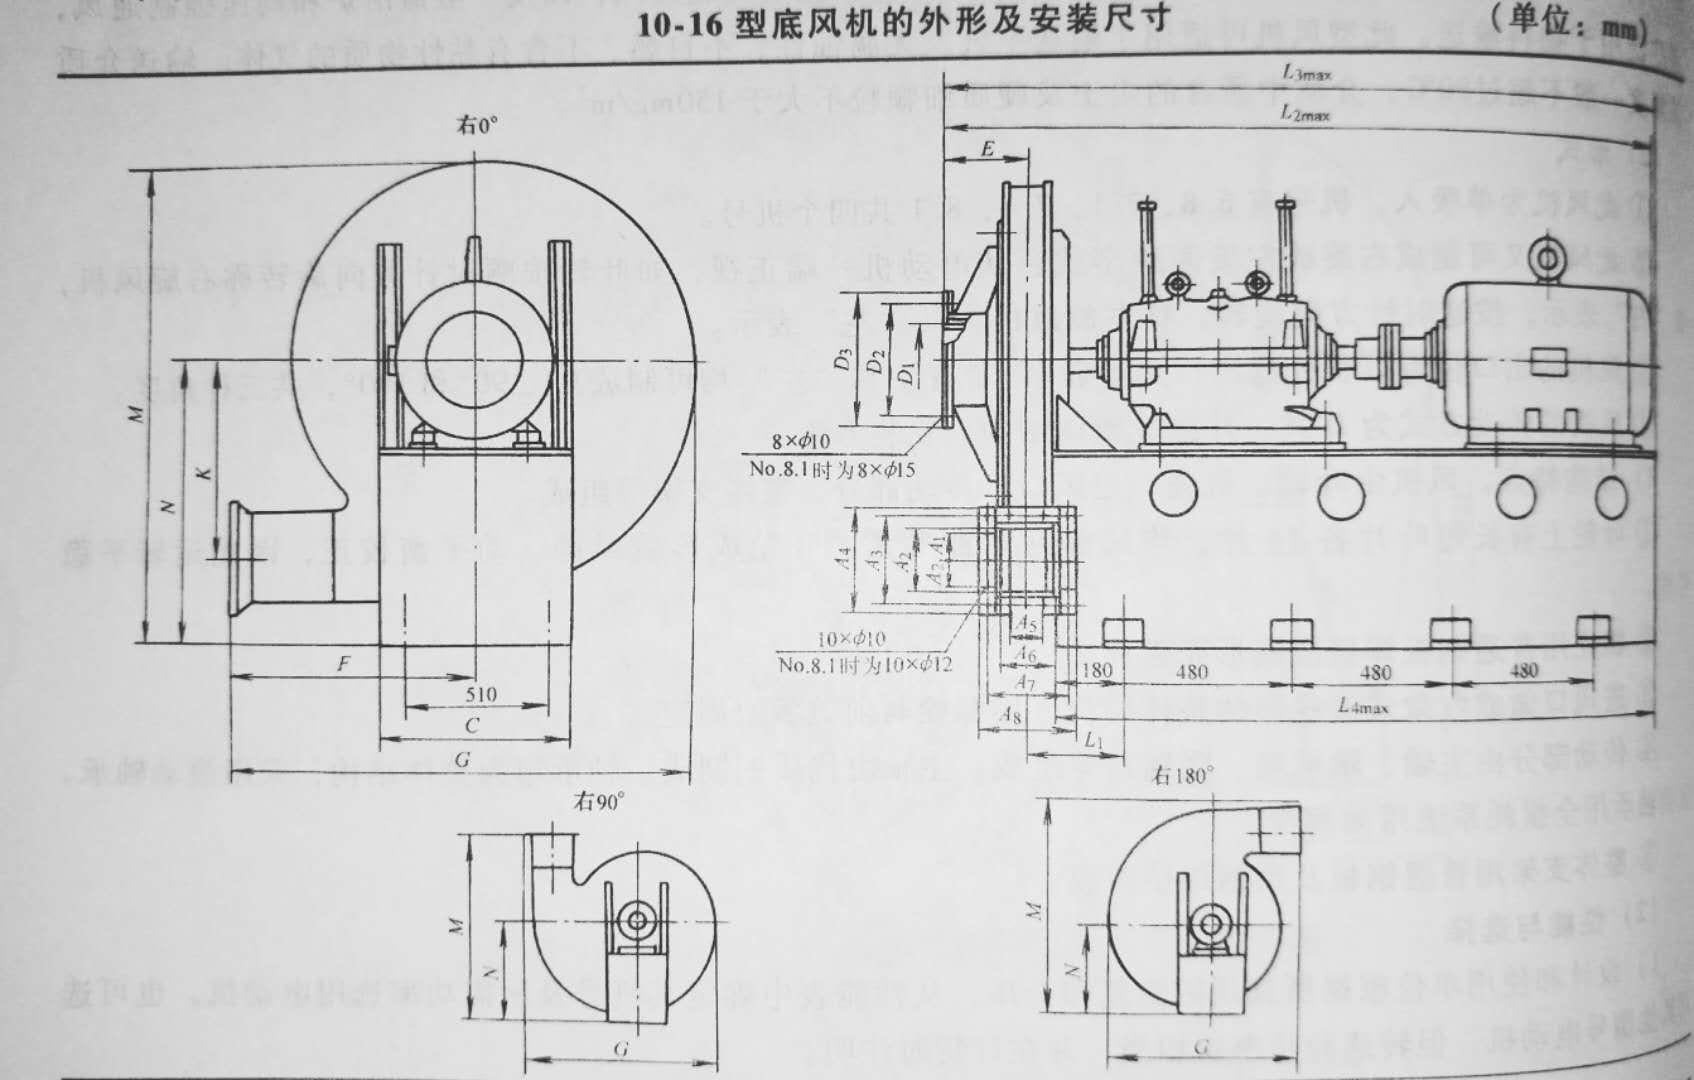 10-18,9-18,9-16 Series High pressure centrifugal fan